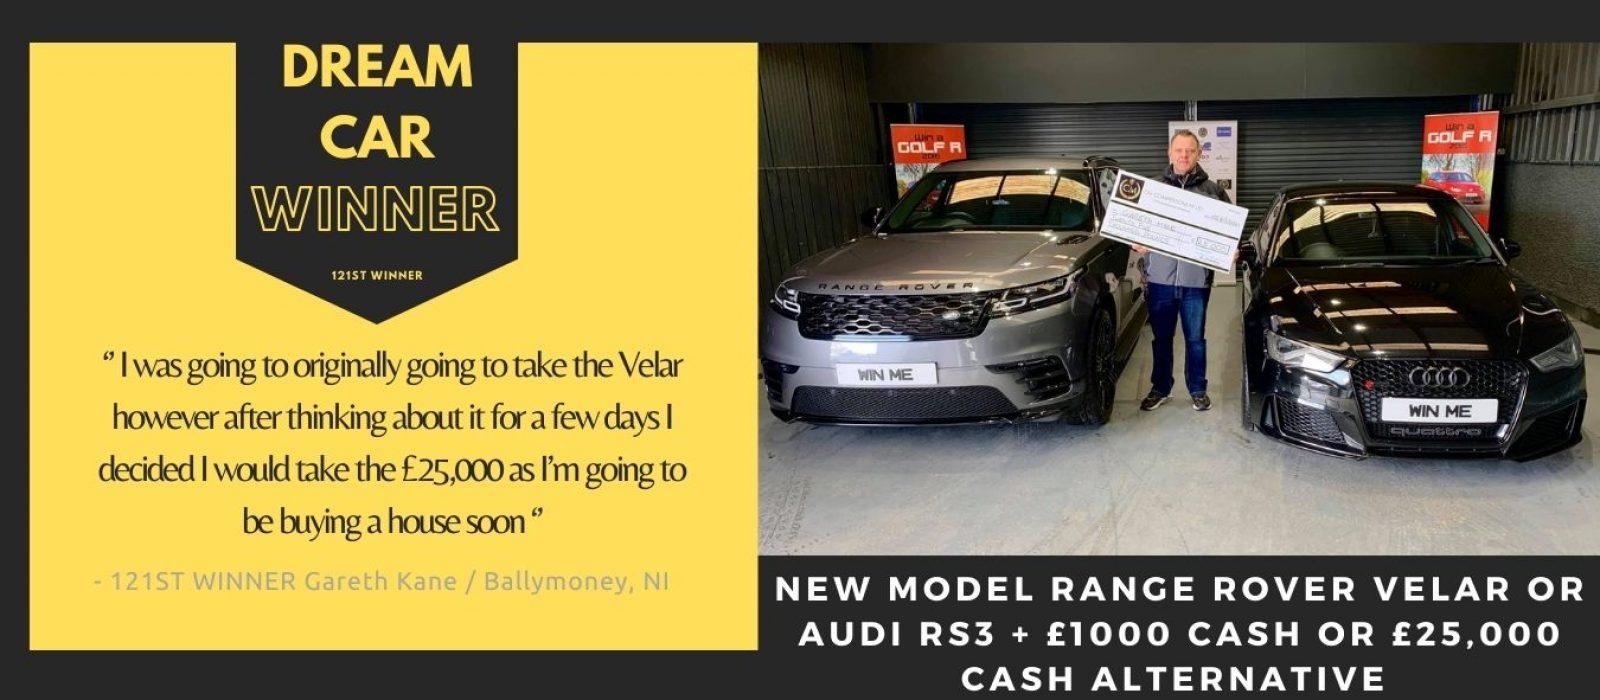 GARETH KANE-Ballymoney-121st Winner-Range Rover Velar or Audi RS3 Or £25,000 Alternative Cash Prize-Cm Competitions NI